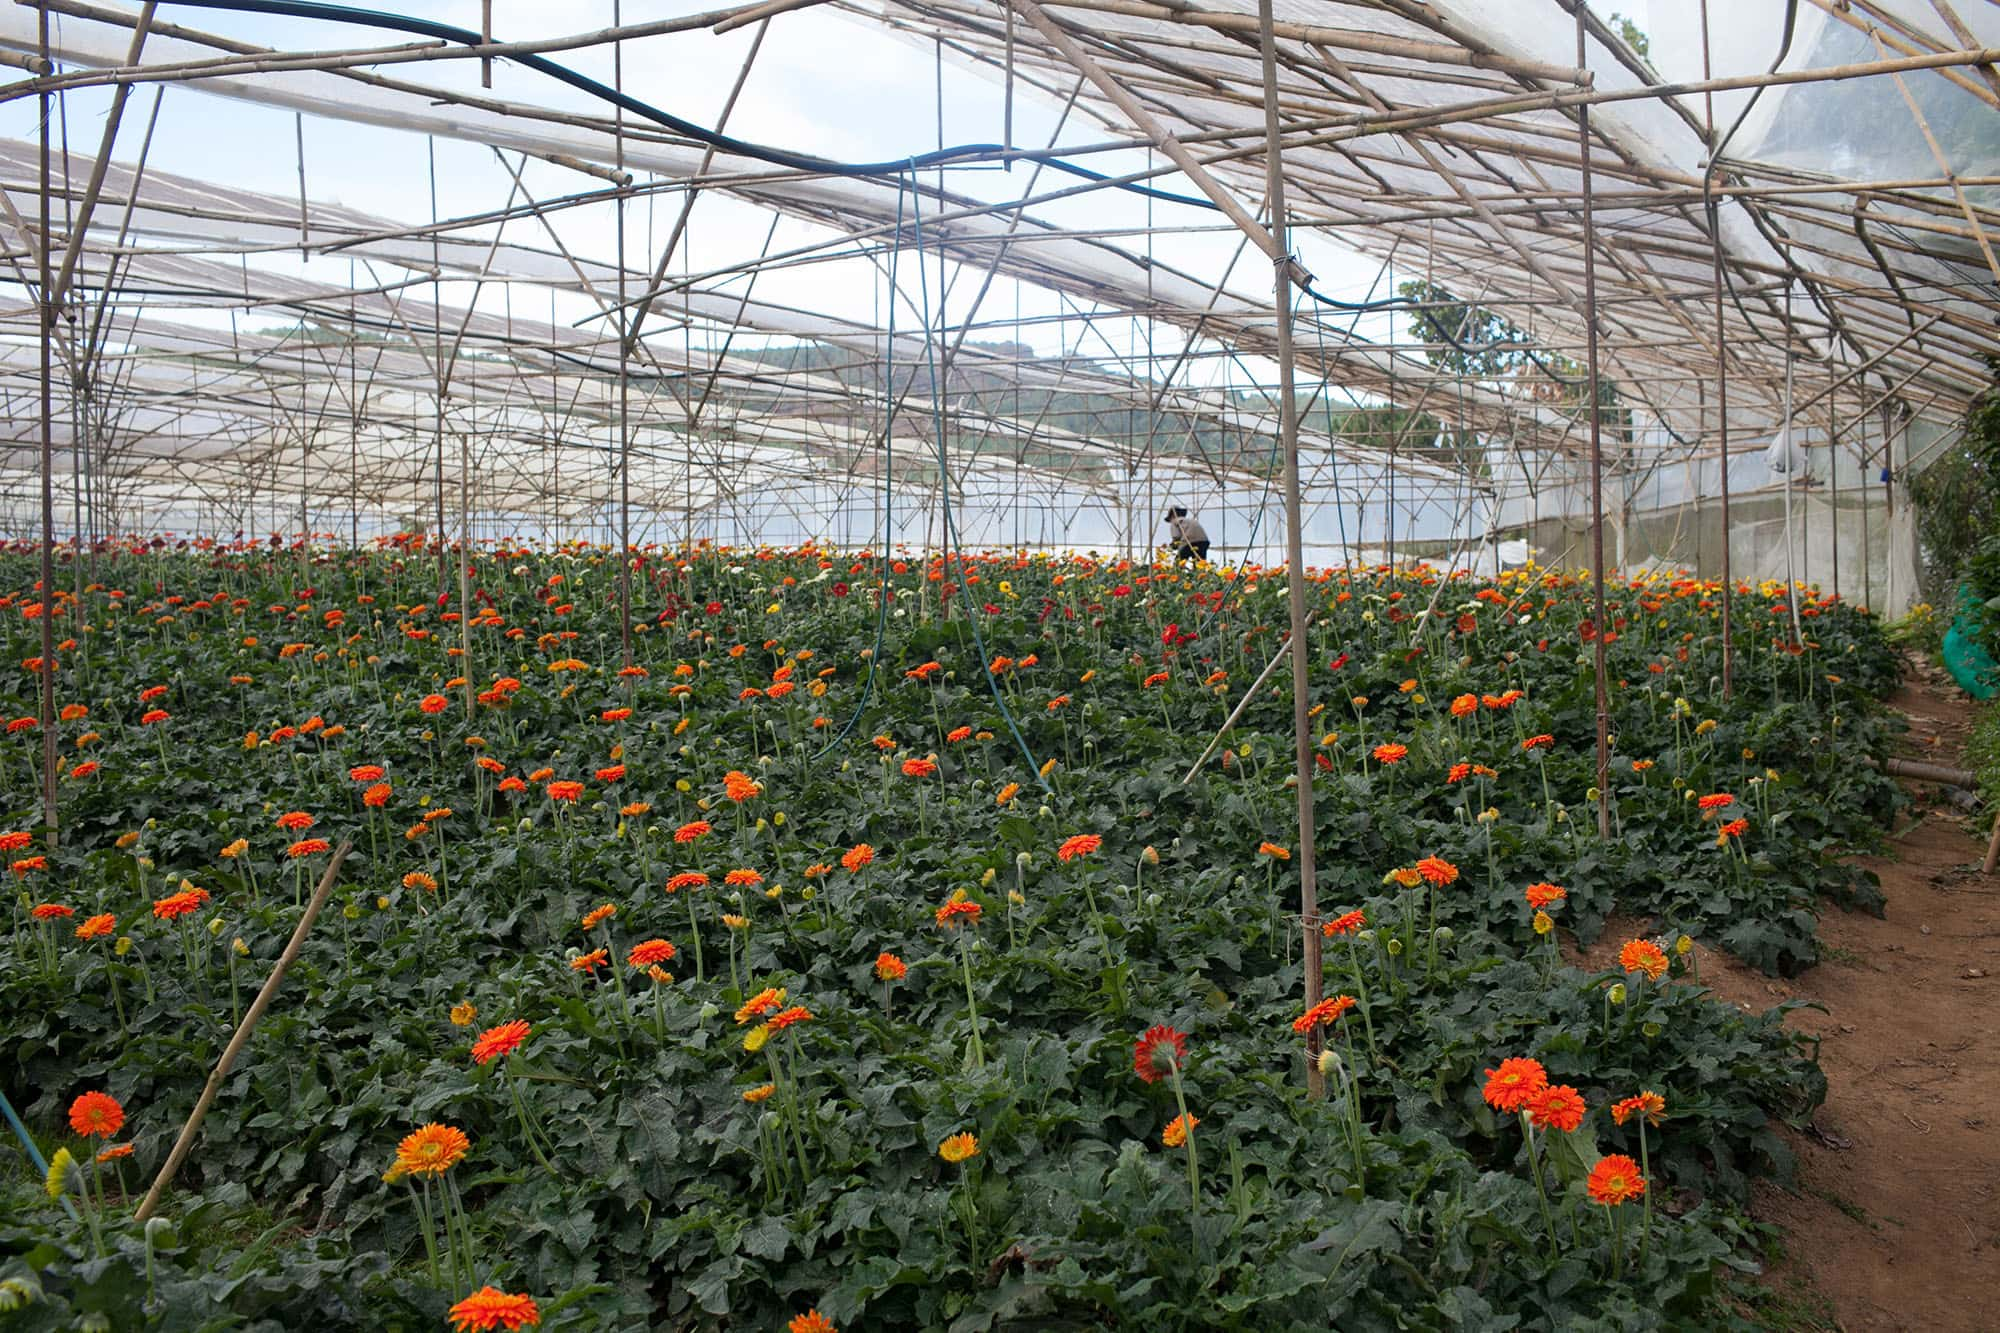 Flower farm in Dalat, Vietnam - Dalat Countryside Tour in Vietnam